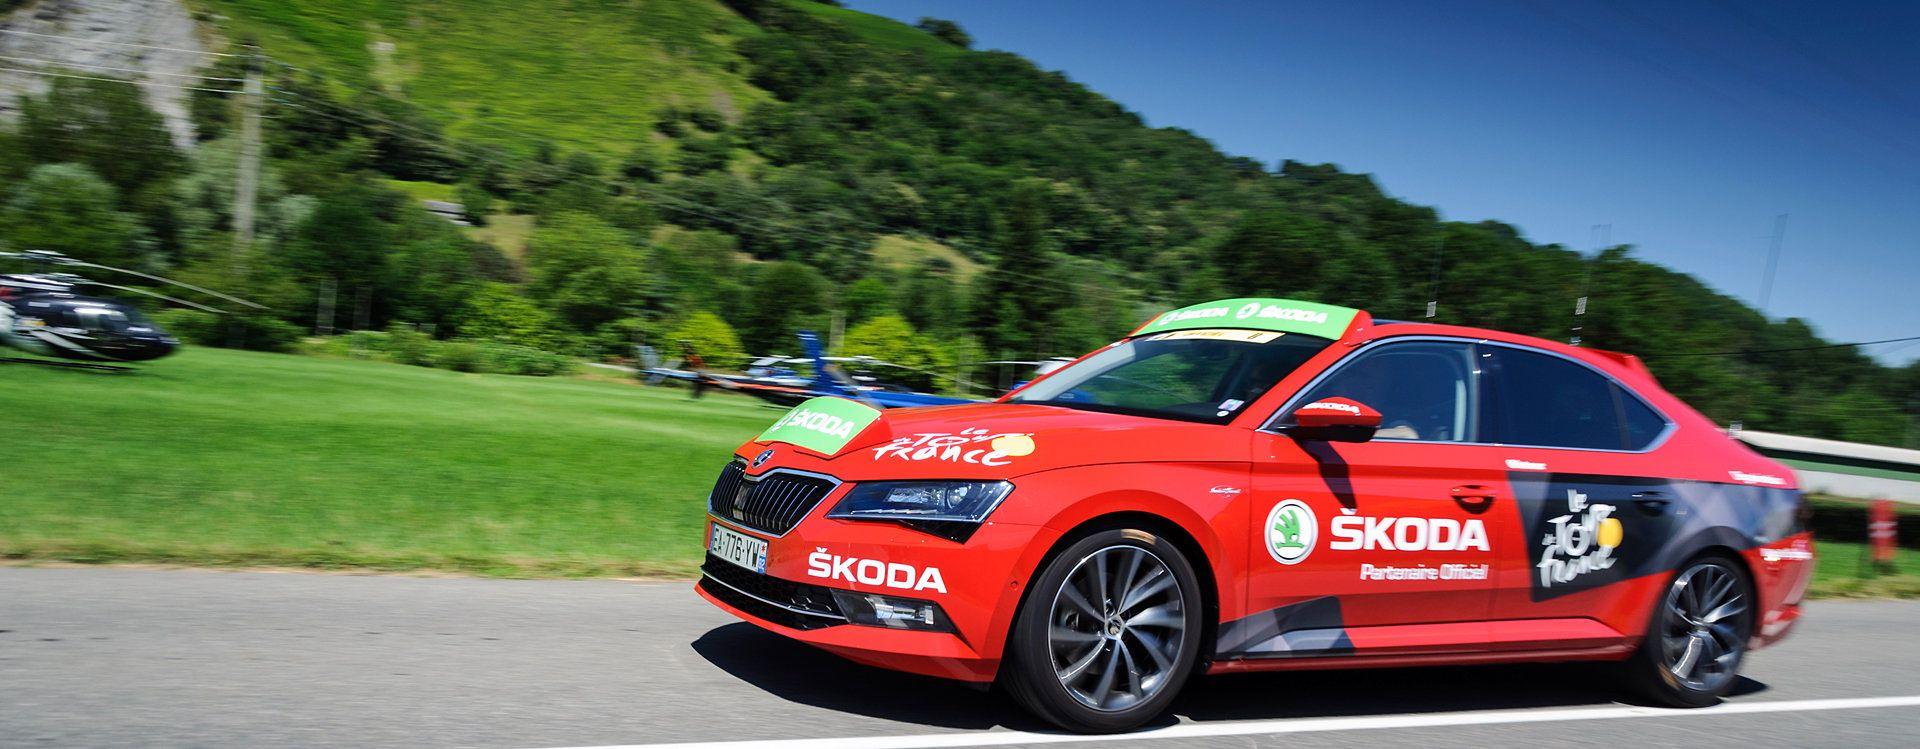 Škoda Superb dyrekcji wyścigu na Tour de France 2016